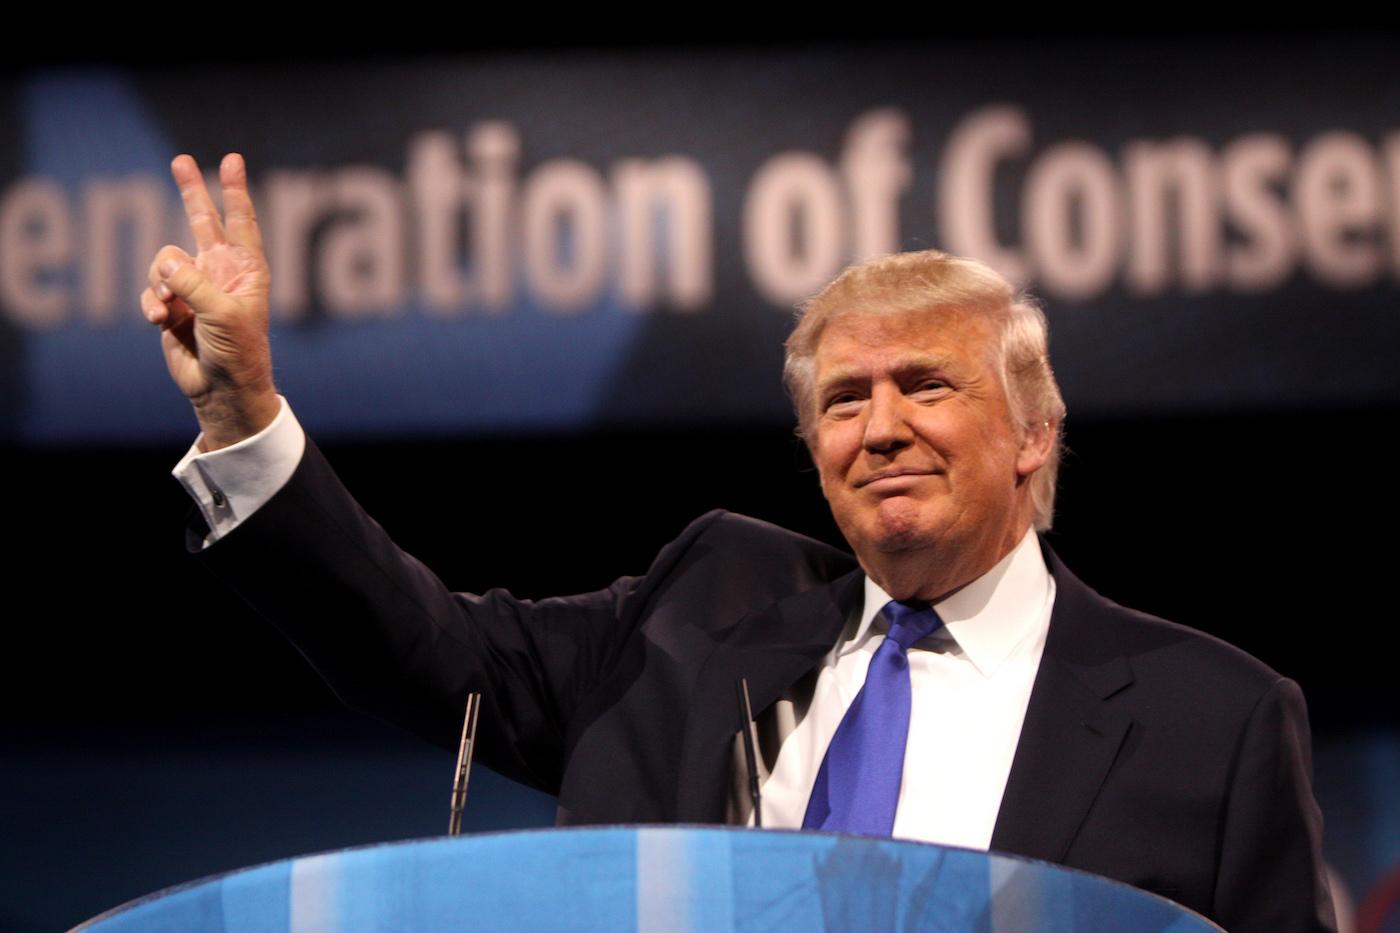 N.Y. attorney general investigating Trump foundation